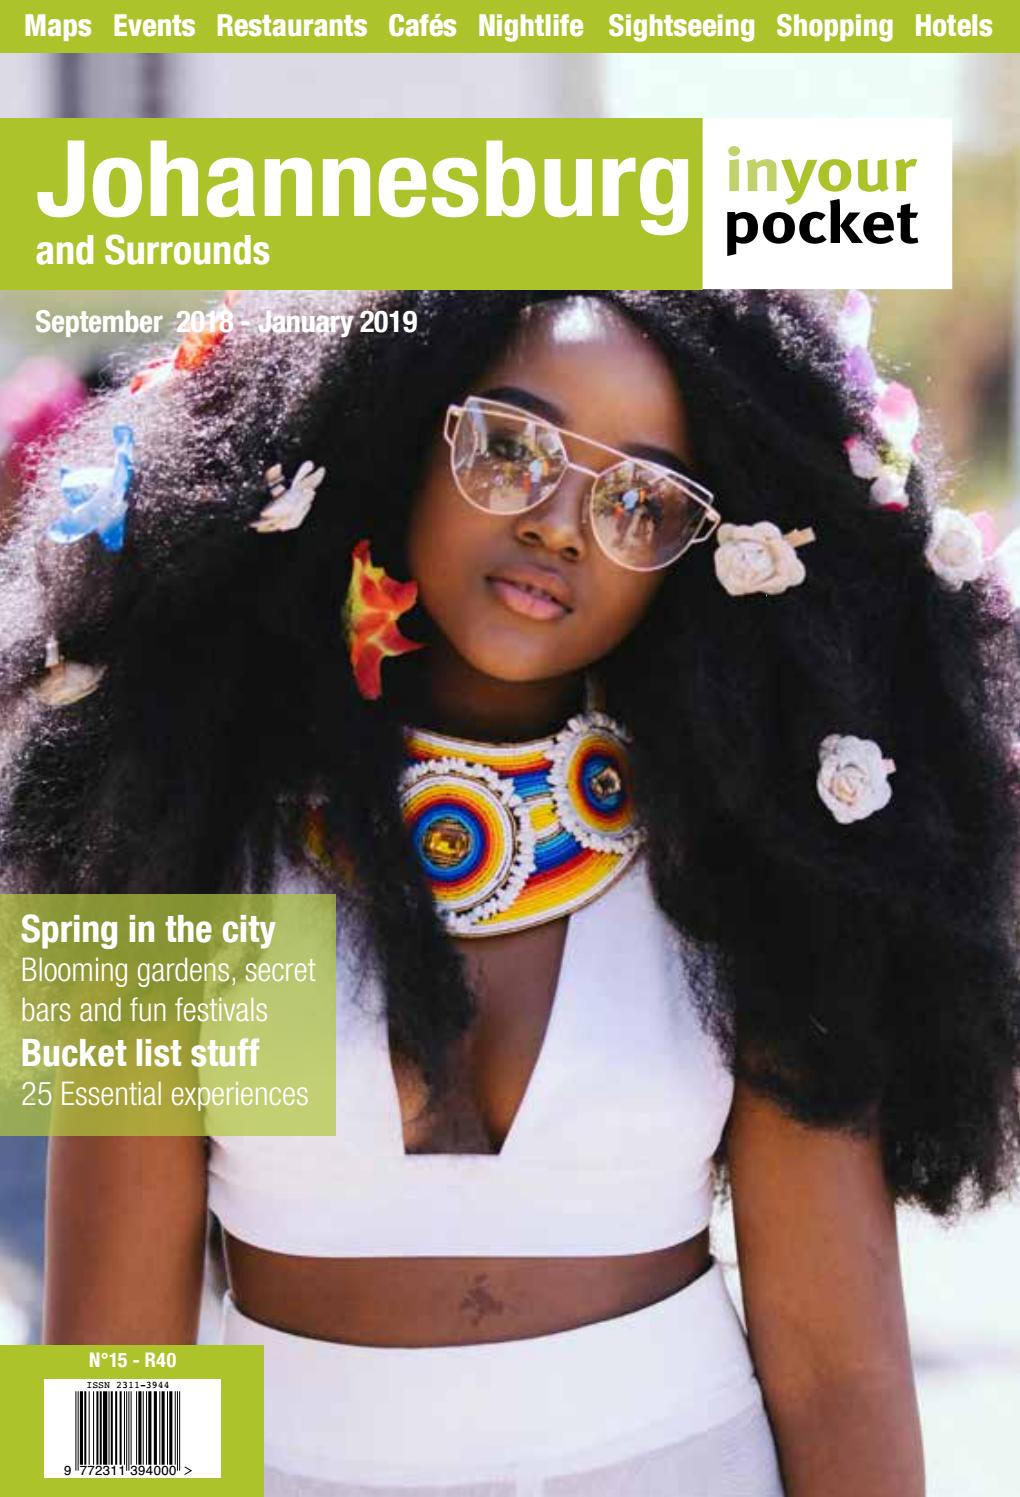 8b143359f0b Johannesburg In Your Pocket Issue 15 - September 2018 - January 2019 ...